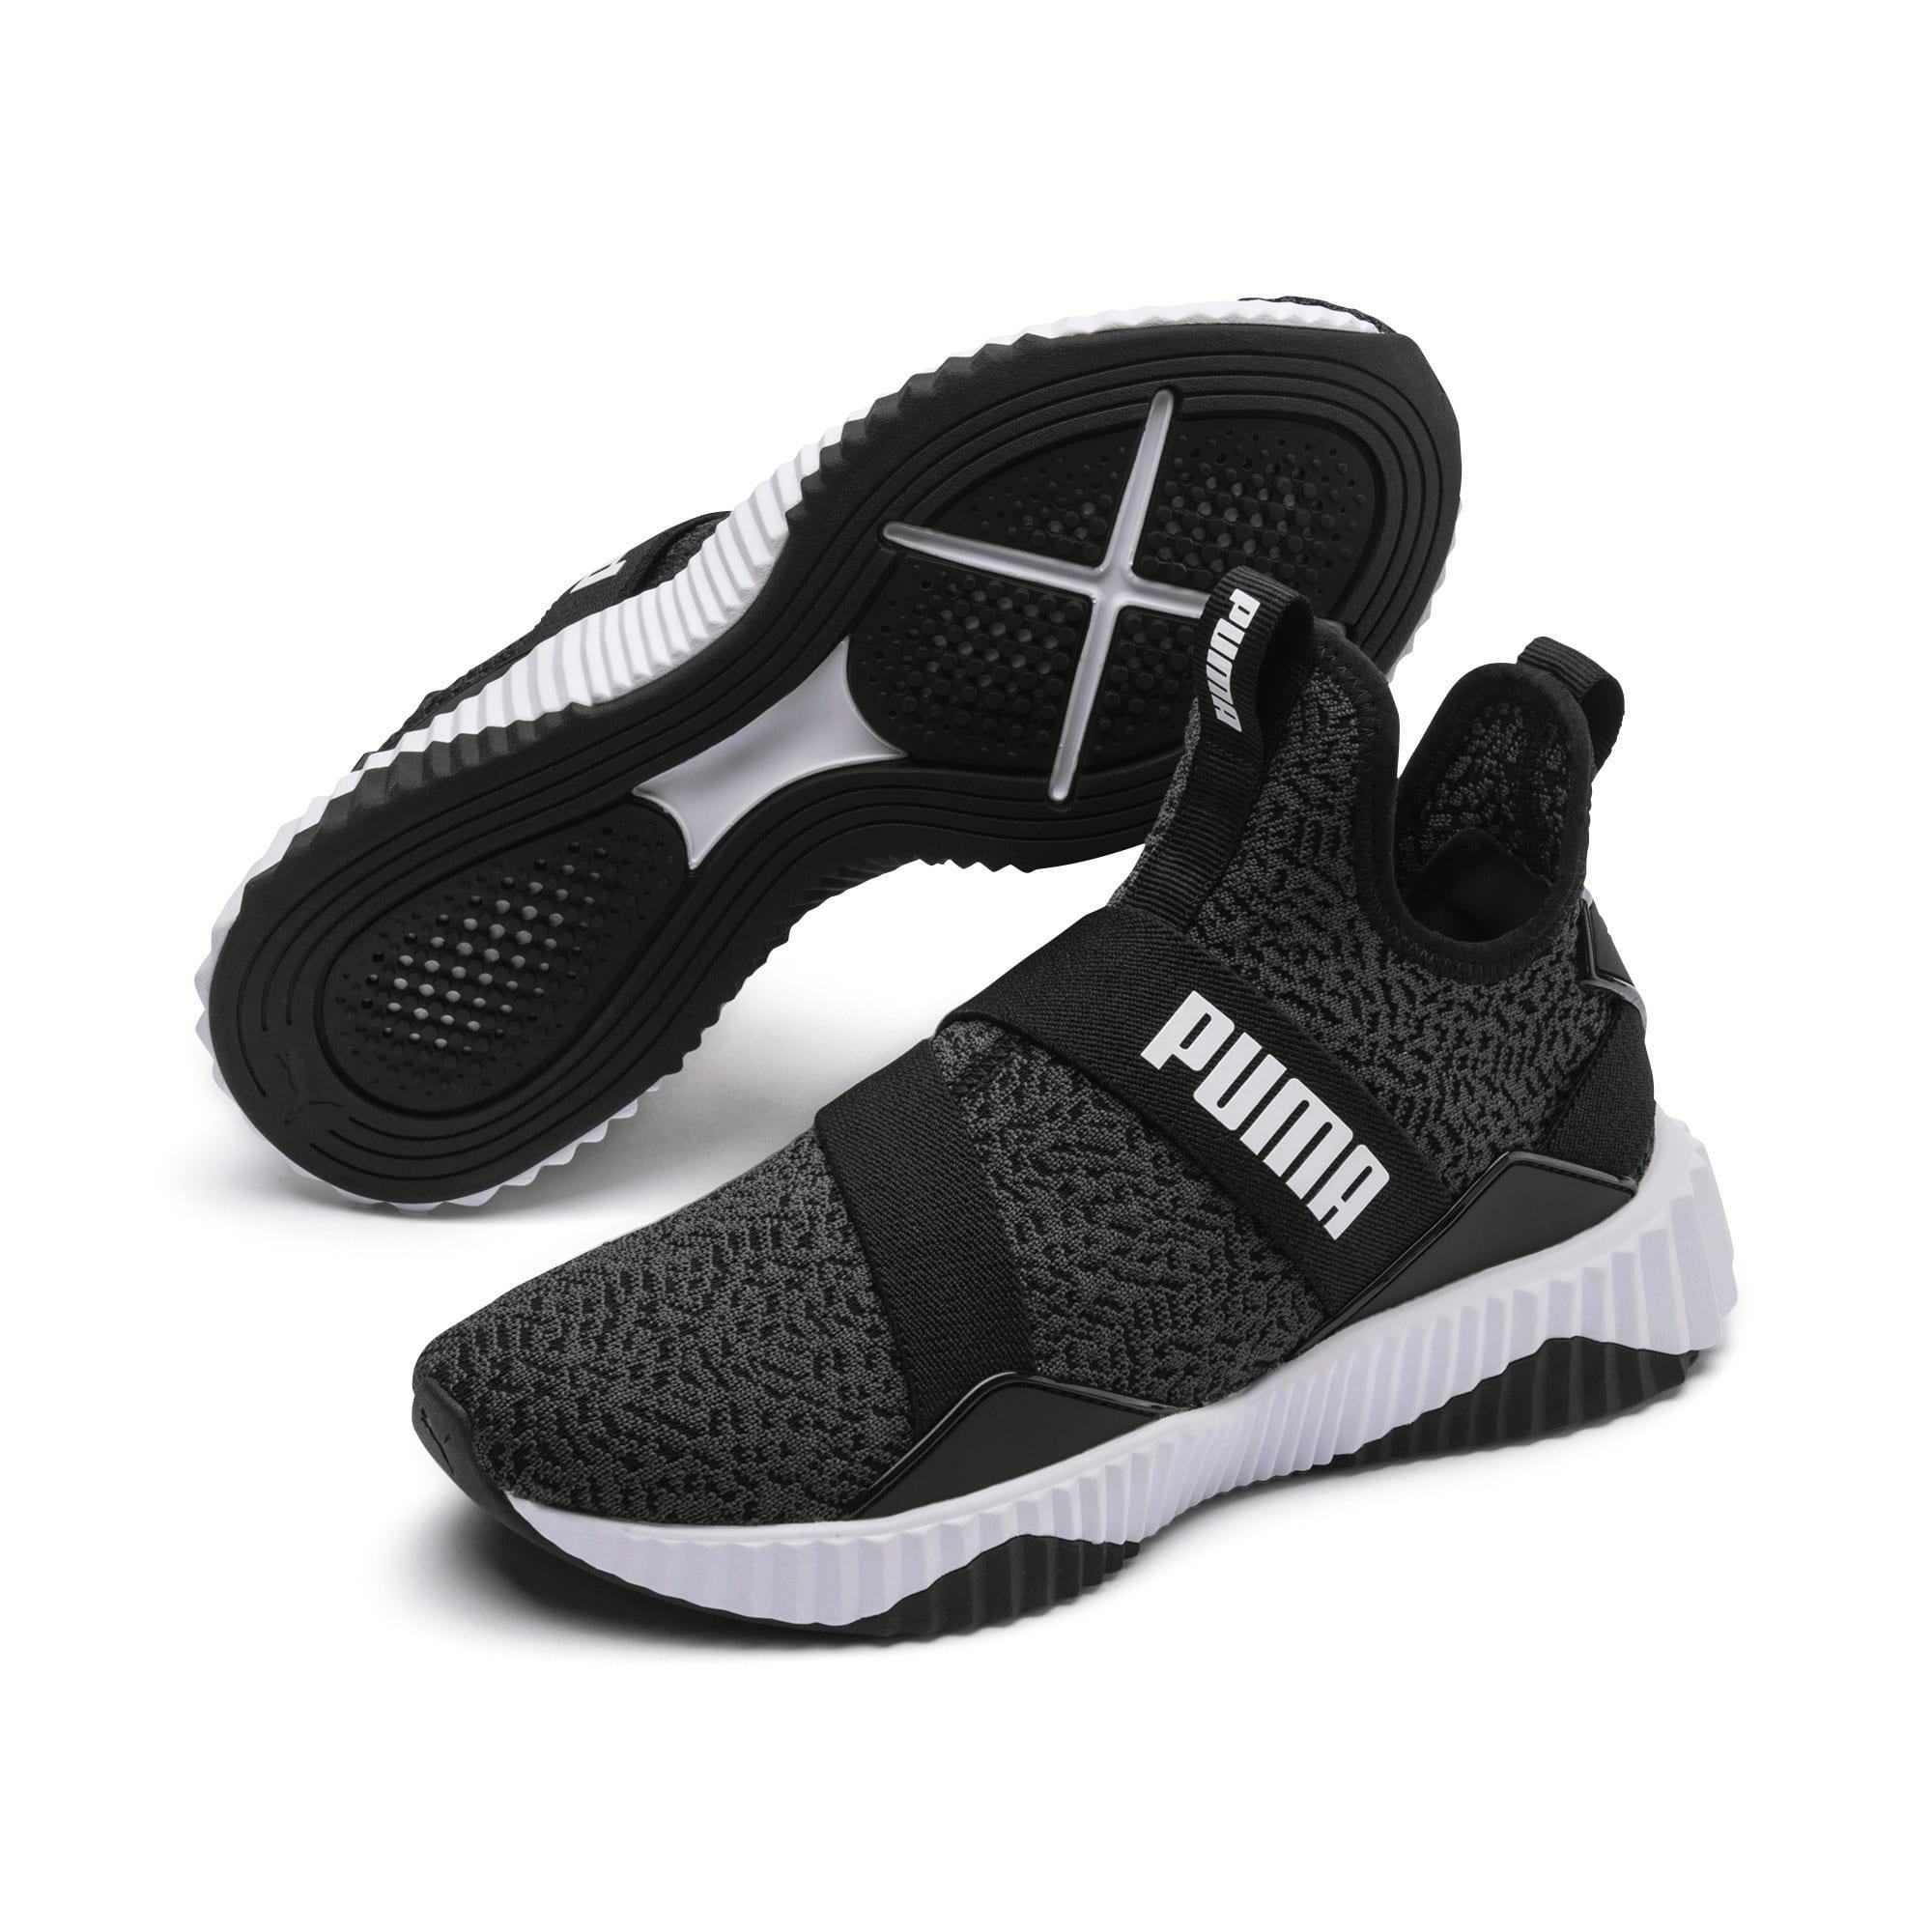 Thumbnail 2 of Defy Mid Animal Women's Training Shoes, Puma Black-Puma White, medium-IND